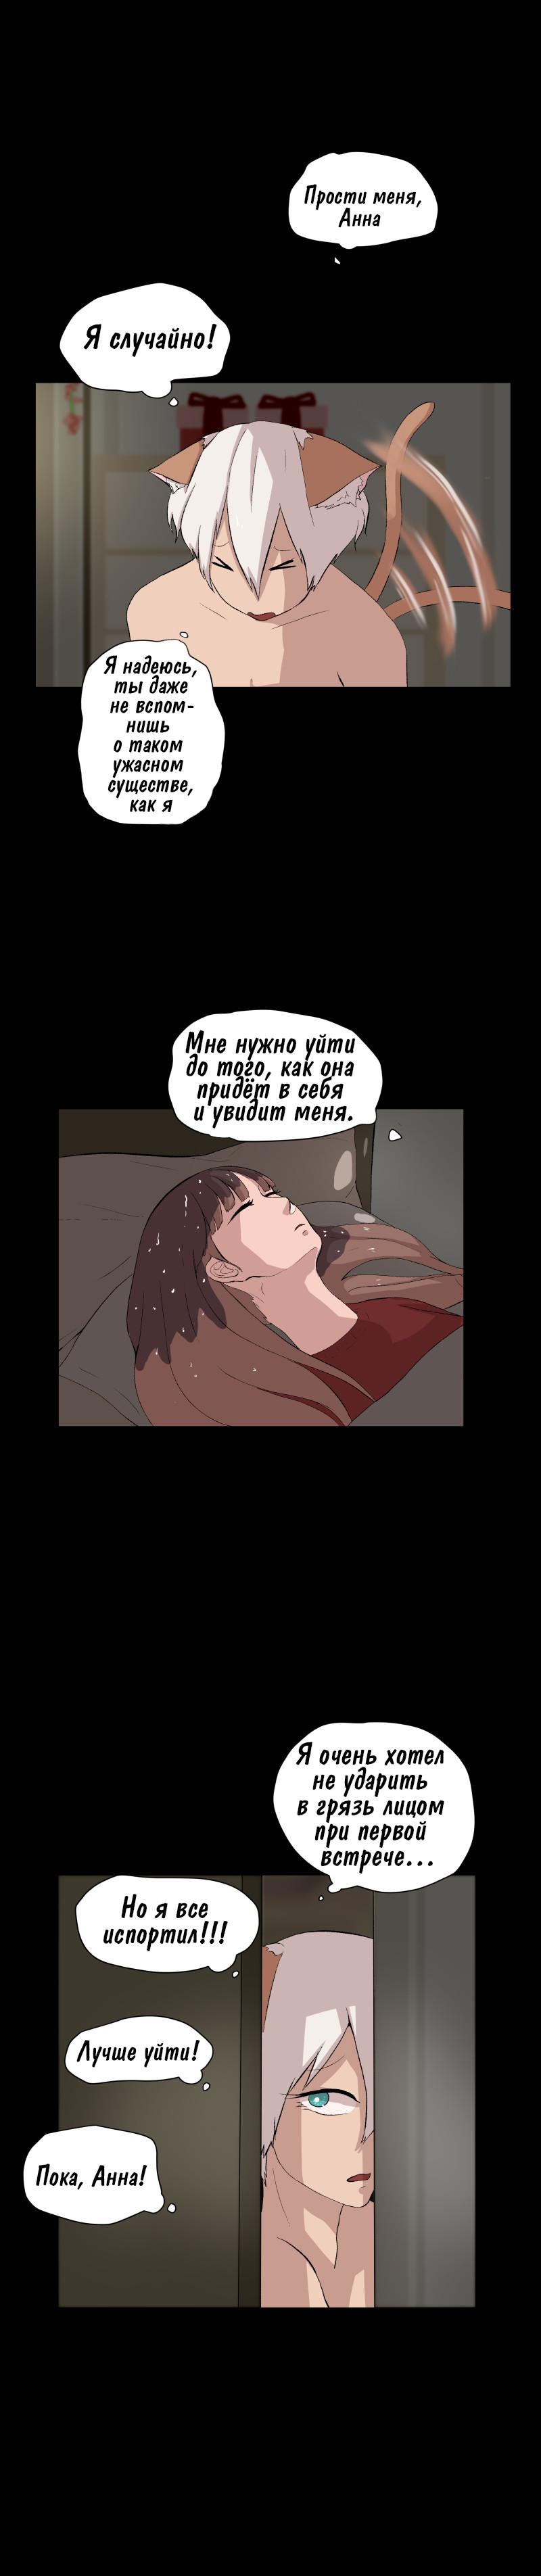 https://r1.ninemanga.com/comics/pic2/58/31802/314463/1481916726564.jpg Page 5